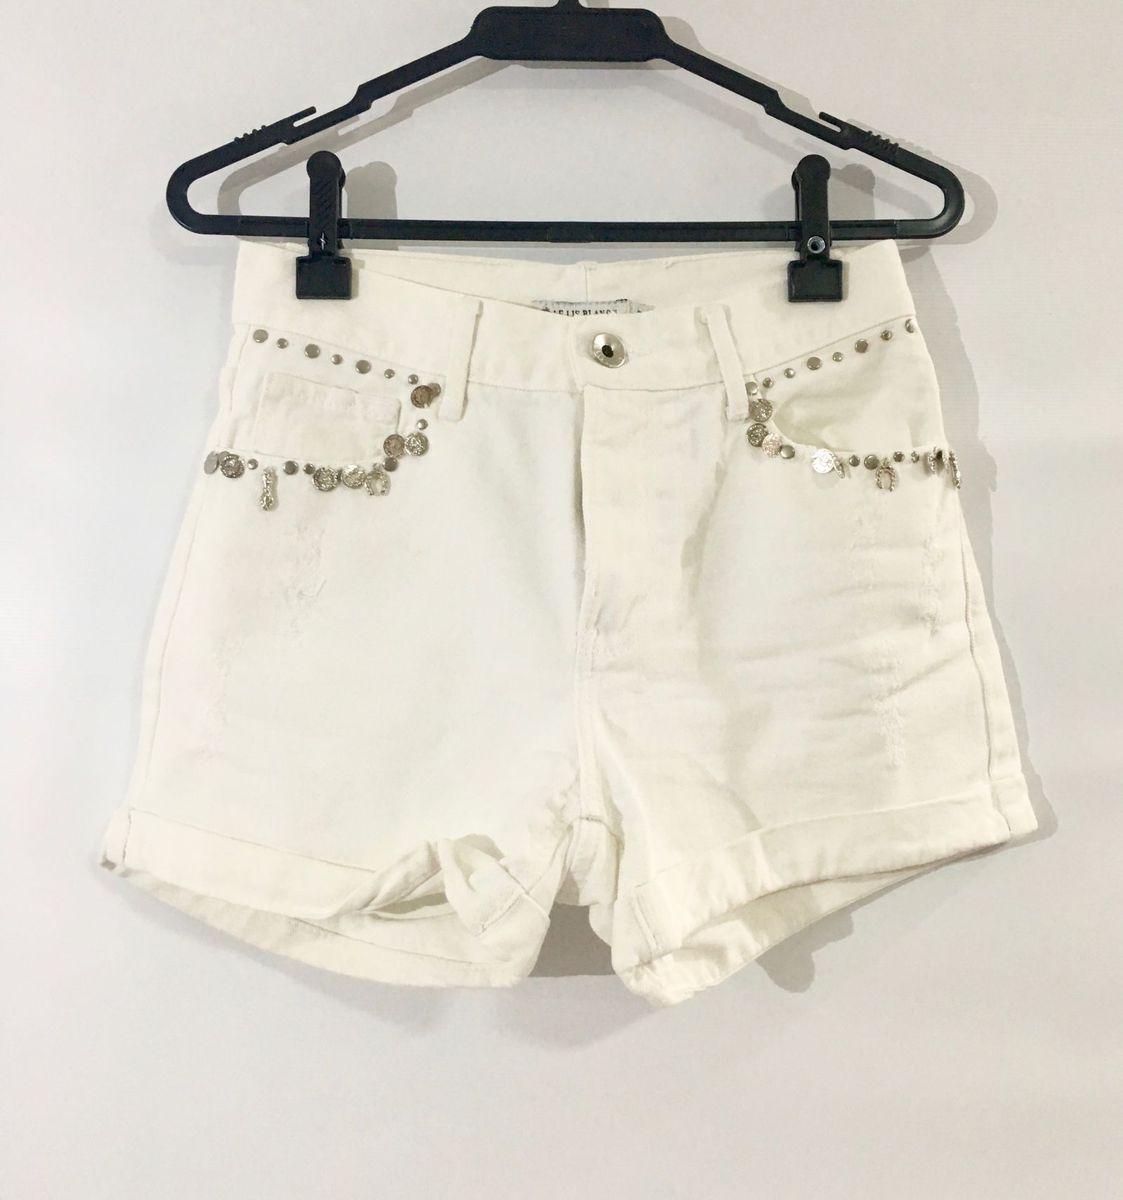 774e7ae51 shorts jeans branco le lis - calças le-lis-blanc.  Czm6ly9wag90b3muzw5qb2vplmnvbs5ici9wcm9kdwn0cy8xndc0otuvngm5ytcxmme5ymu4odu0mti4njnlndbjodk3ywfioweuanbn  ...